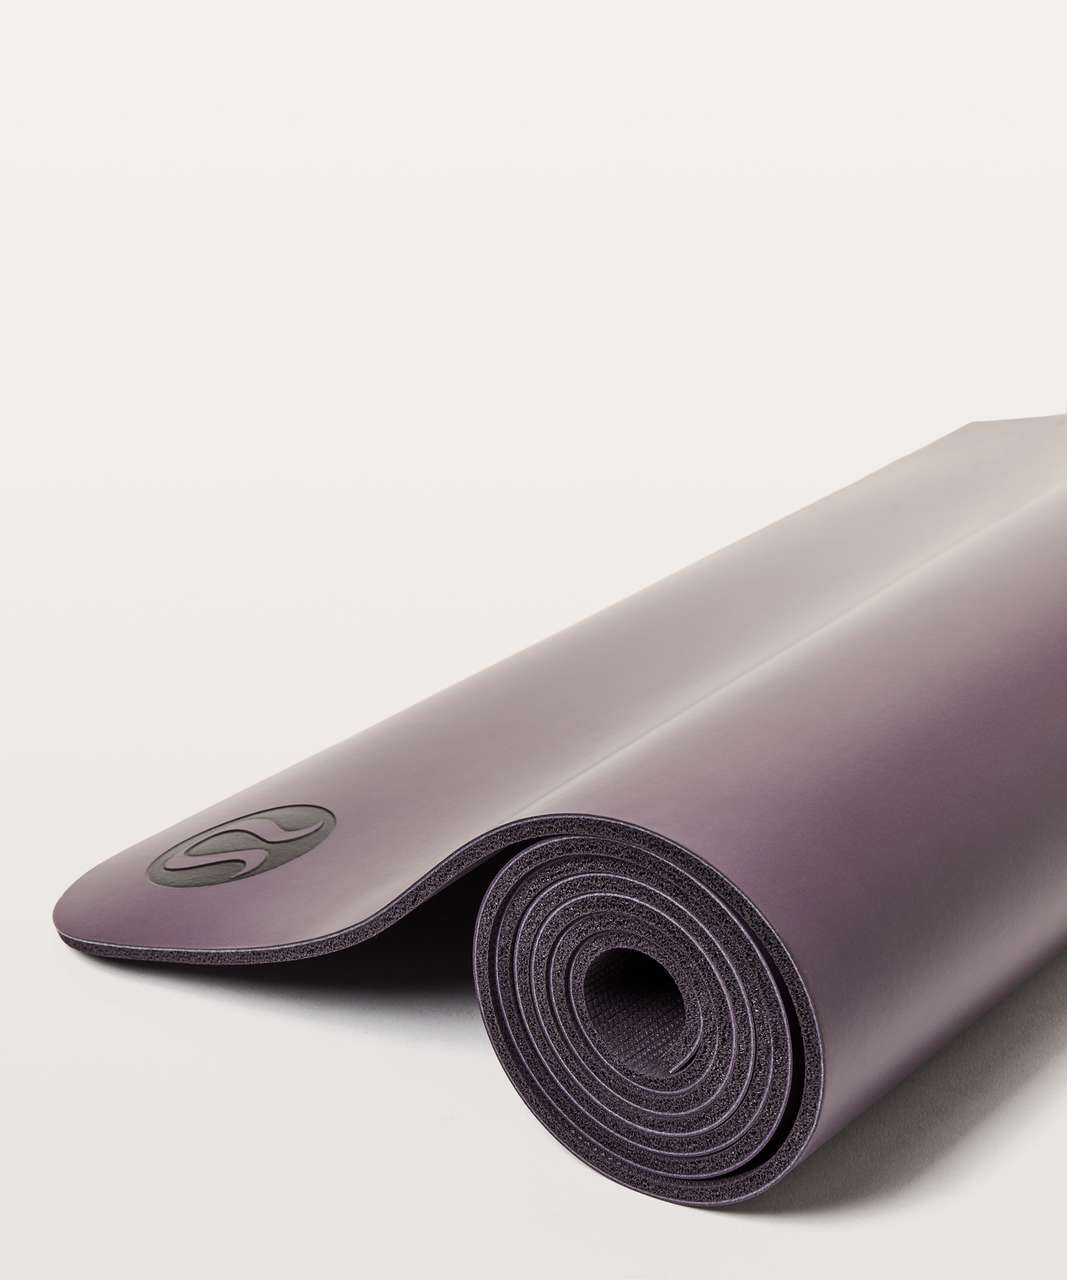 How To Wash Your Lululemon Yoga Mat | Kayaworkout.co